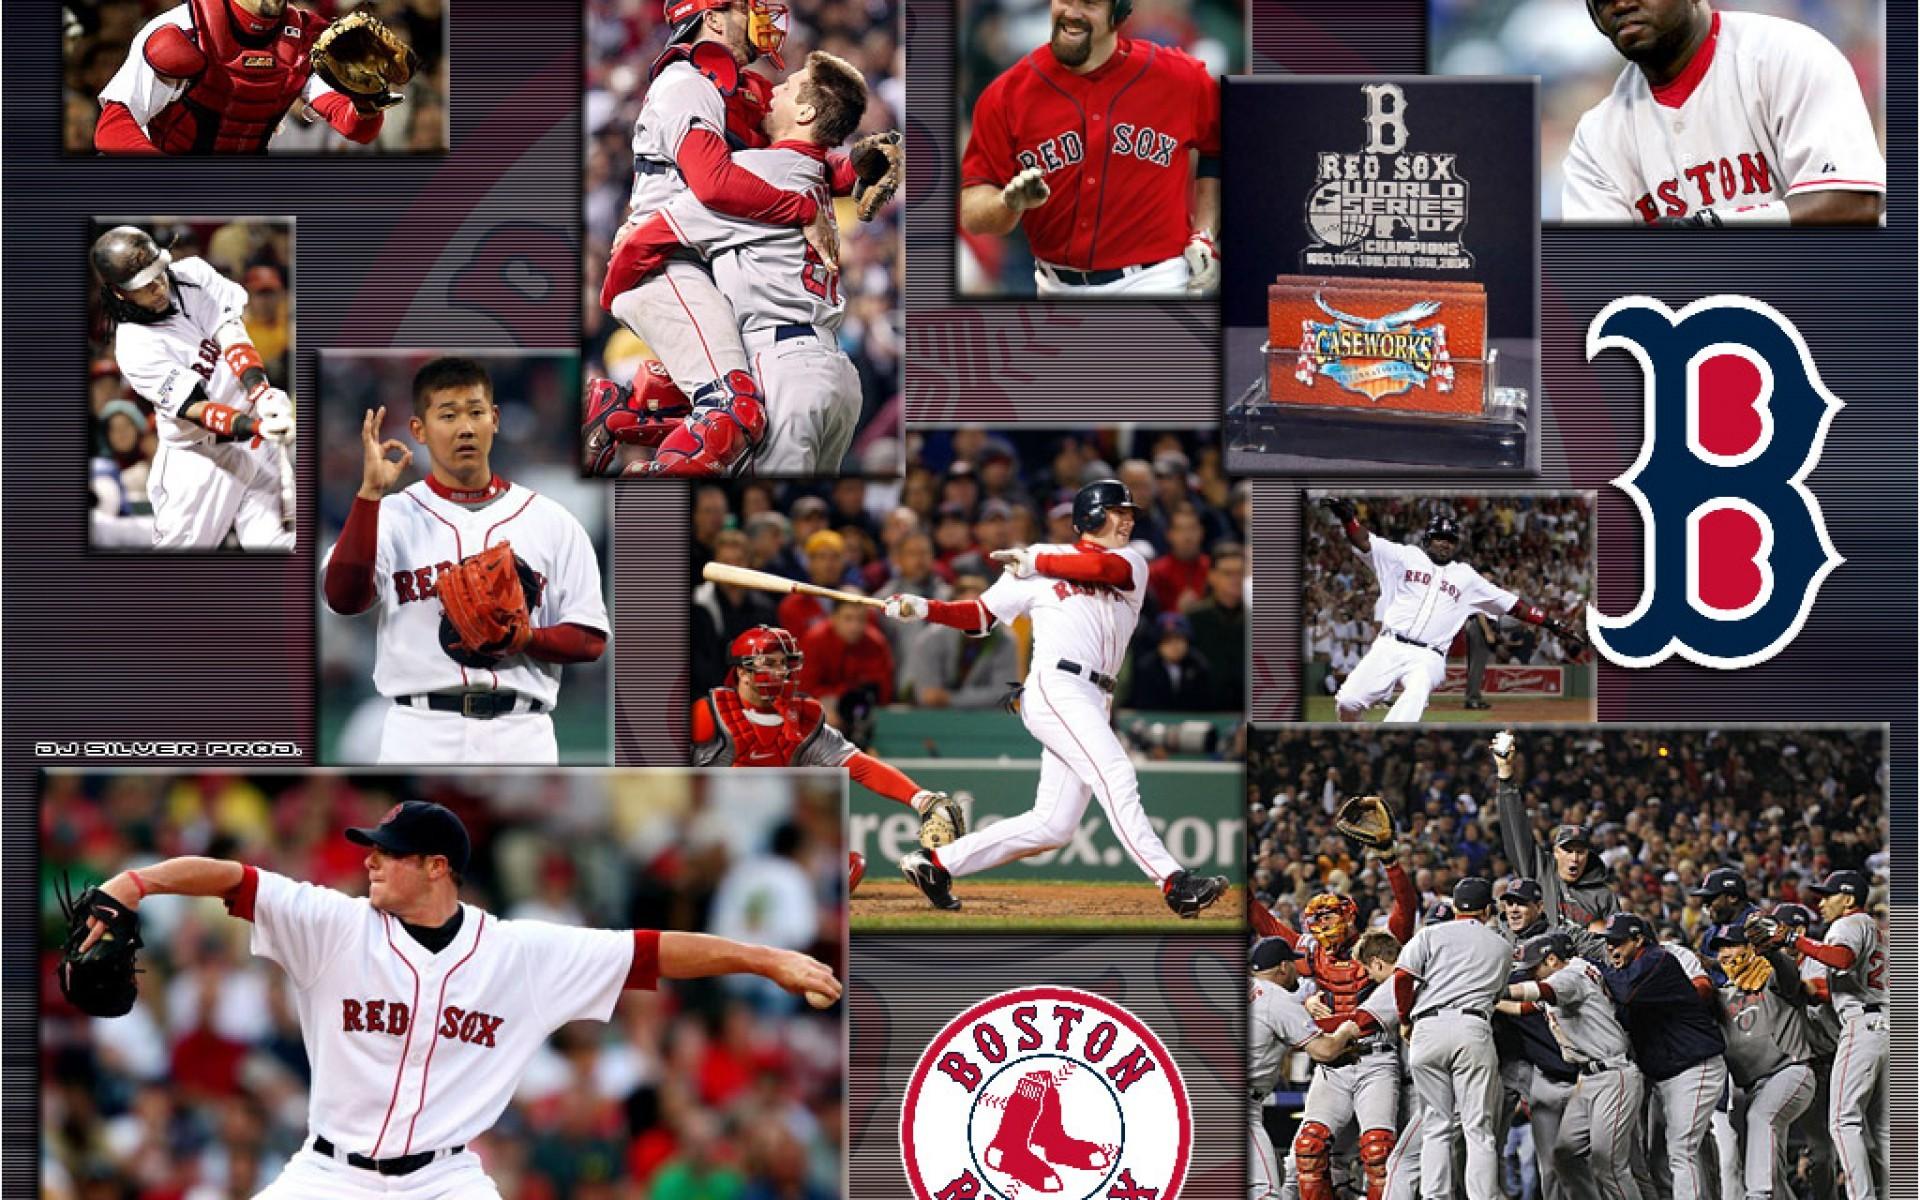 BOSTON RED SOX baseball mlb gh wallpaper | | 158192 | WallpaperUP